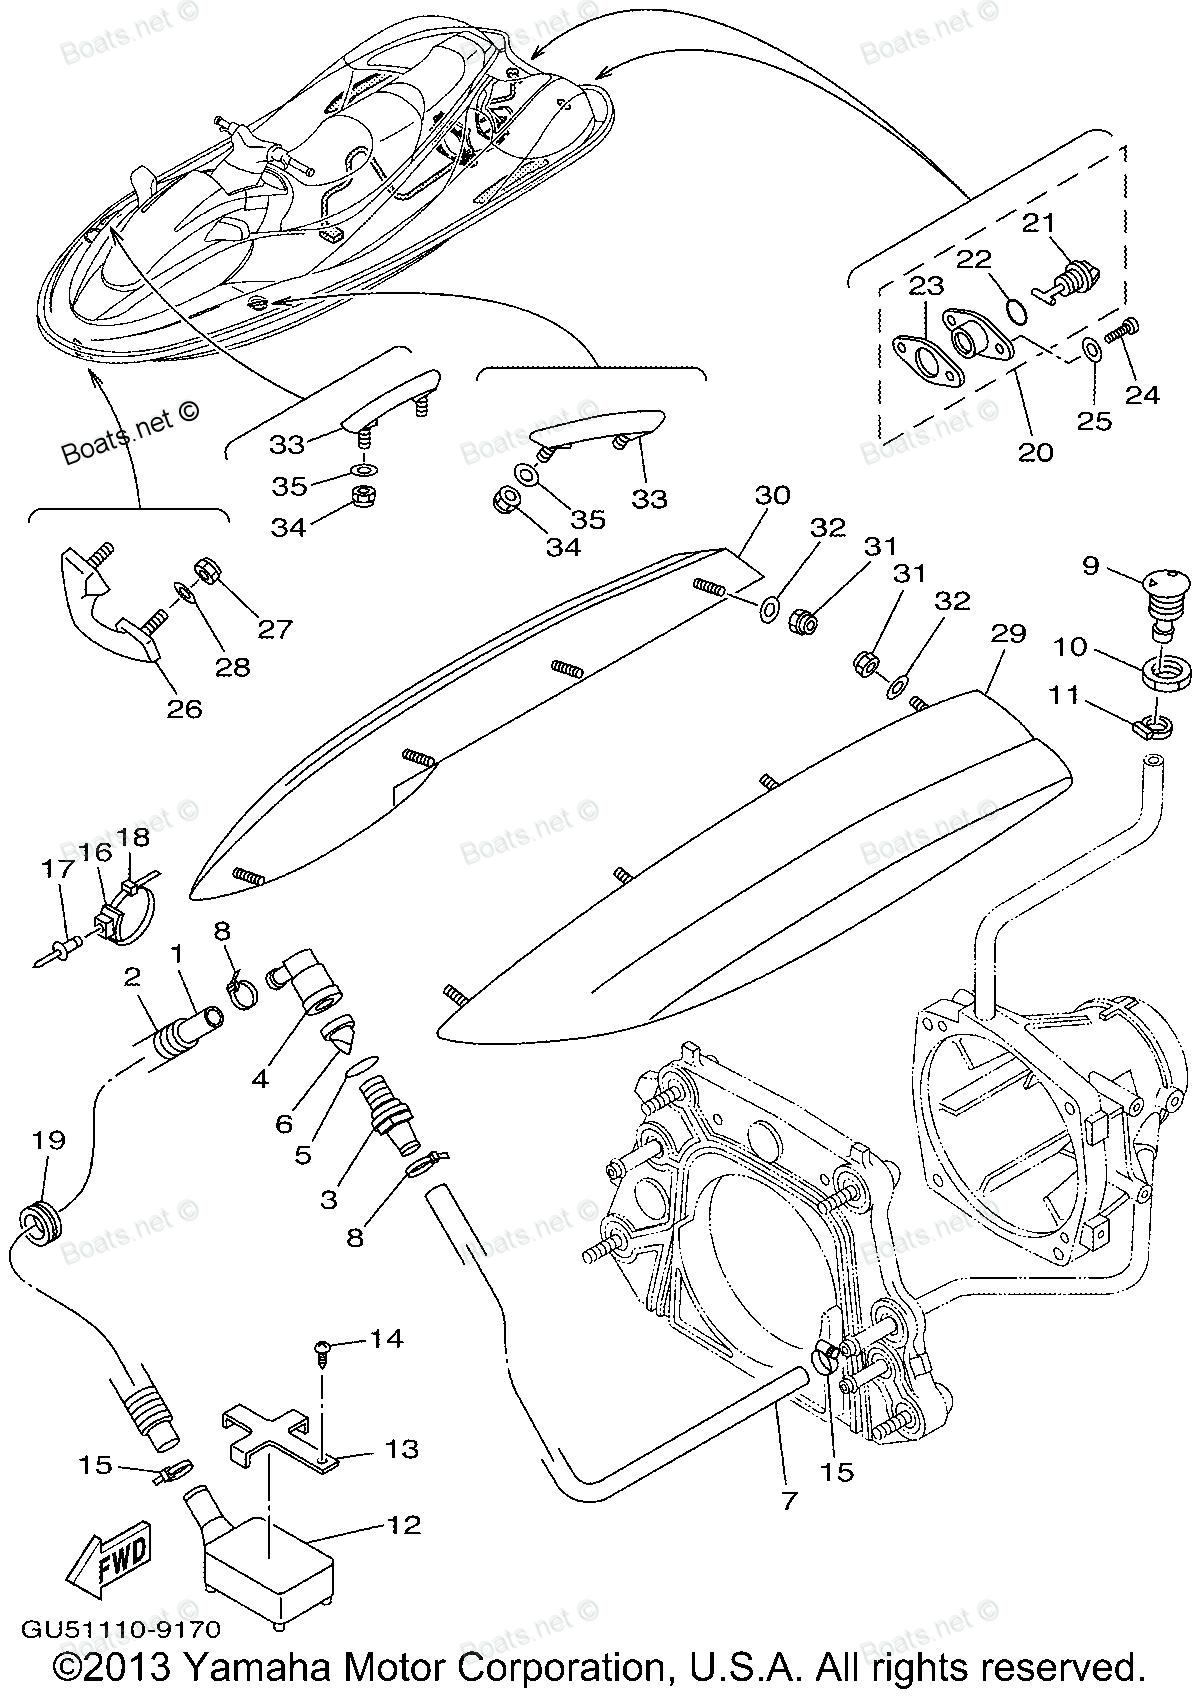 SV1200Z%252FIMAGES%252FHULL_DECK Yamaha Suv Waverunner Wiring Diagram on yamaha waverunner user manual, yamaha waverunner radio, yamaha waverunner schematics, yamaha 650 waverunner electrical, yamaha r1 wiring diagram, yamaha viking wiring diagram, yamaha outboard wiring diagram, yamaha waverunner carburetor, yamaha waverunner fuel pump, yamaha banshee wiring diagram, yamaha waverunner parts, yamaha golf car wiring diagram, yamaha waverunner wiring gauge, yamaha waverunner cooling system, yamaha zuma wiring diagram, yamaha waverunner crankshaft, yamaha waverunner exhaust diagram, yamaha blaster wiring diagram, yamaha waverunner owner's manual, yamaha waverunner engine,